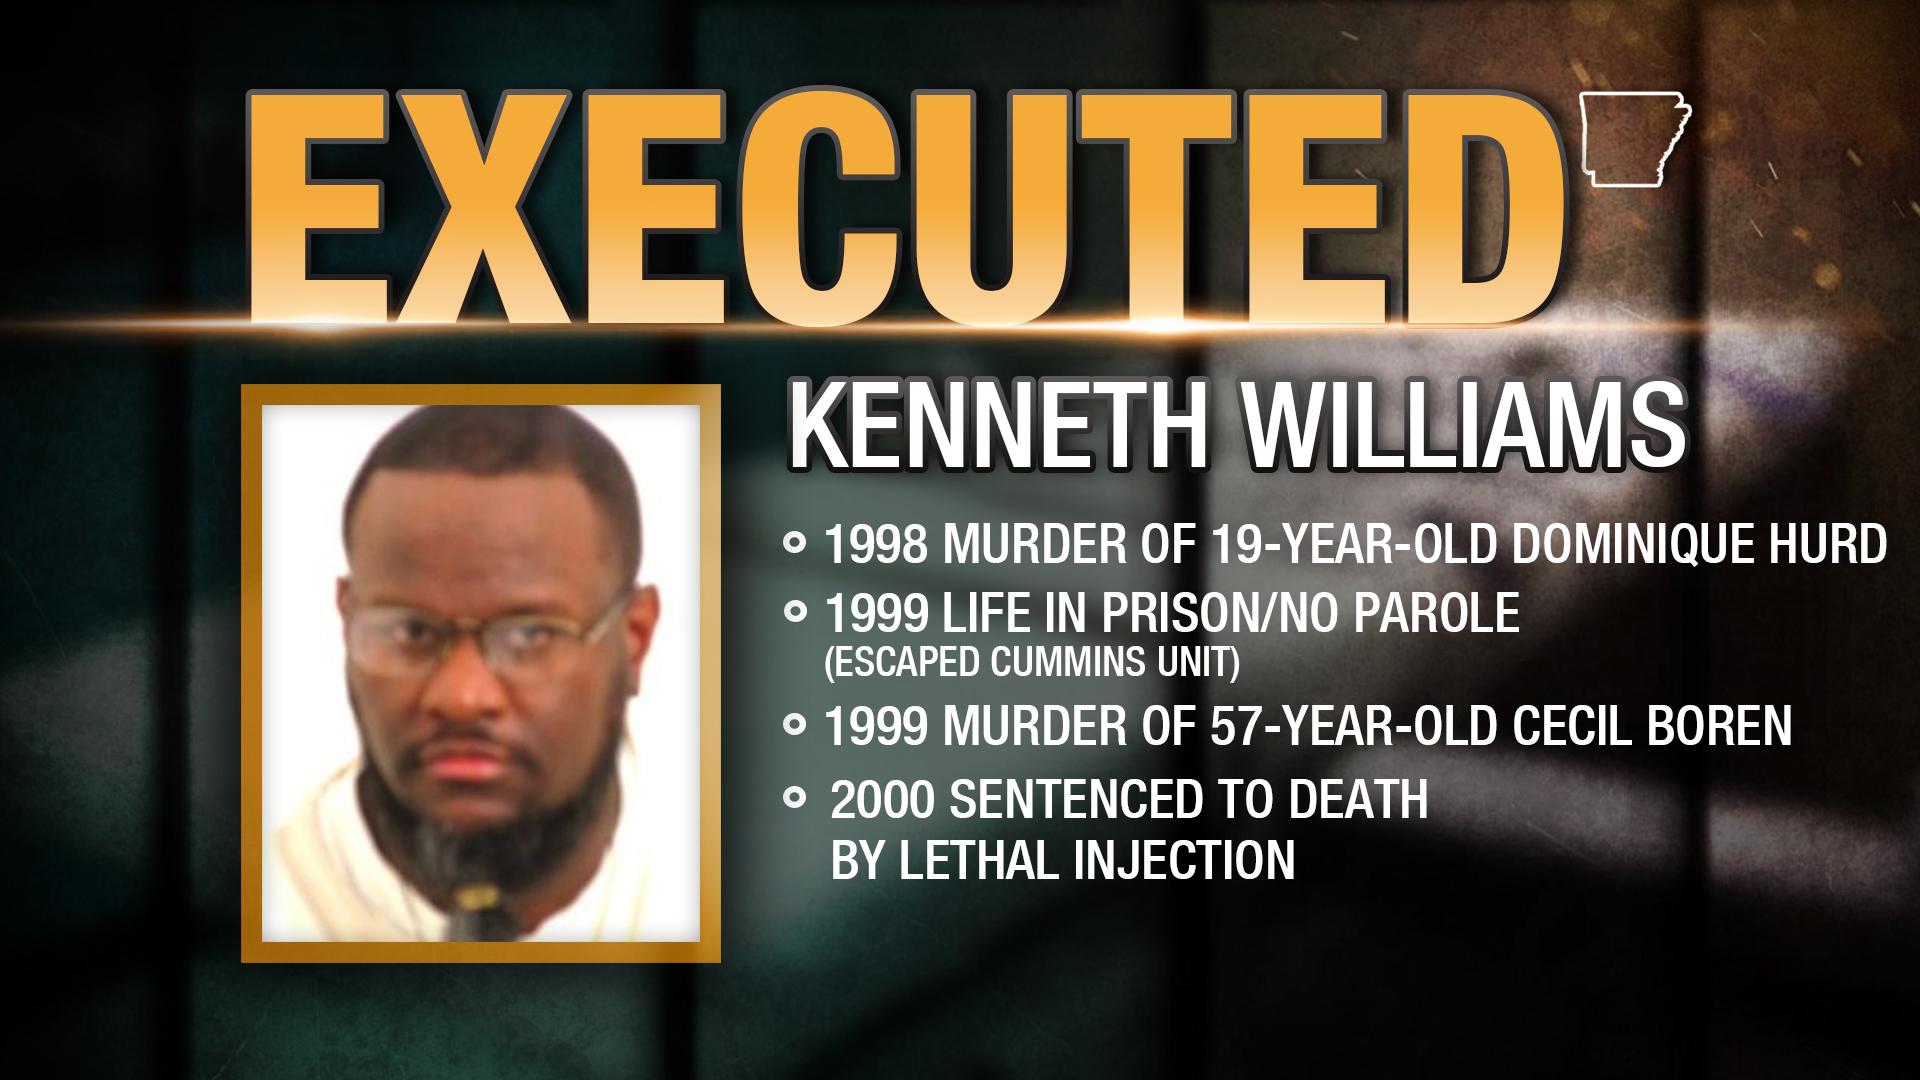 KENNETH WILLIAMS_EXECUTED_1493359715086-118809306.jpg